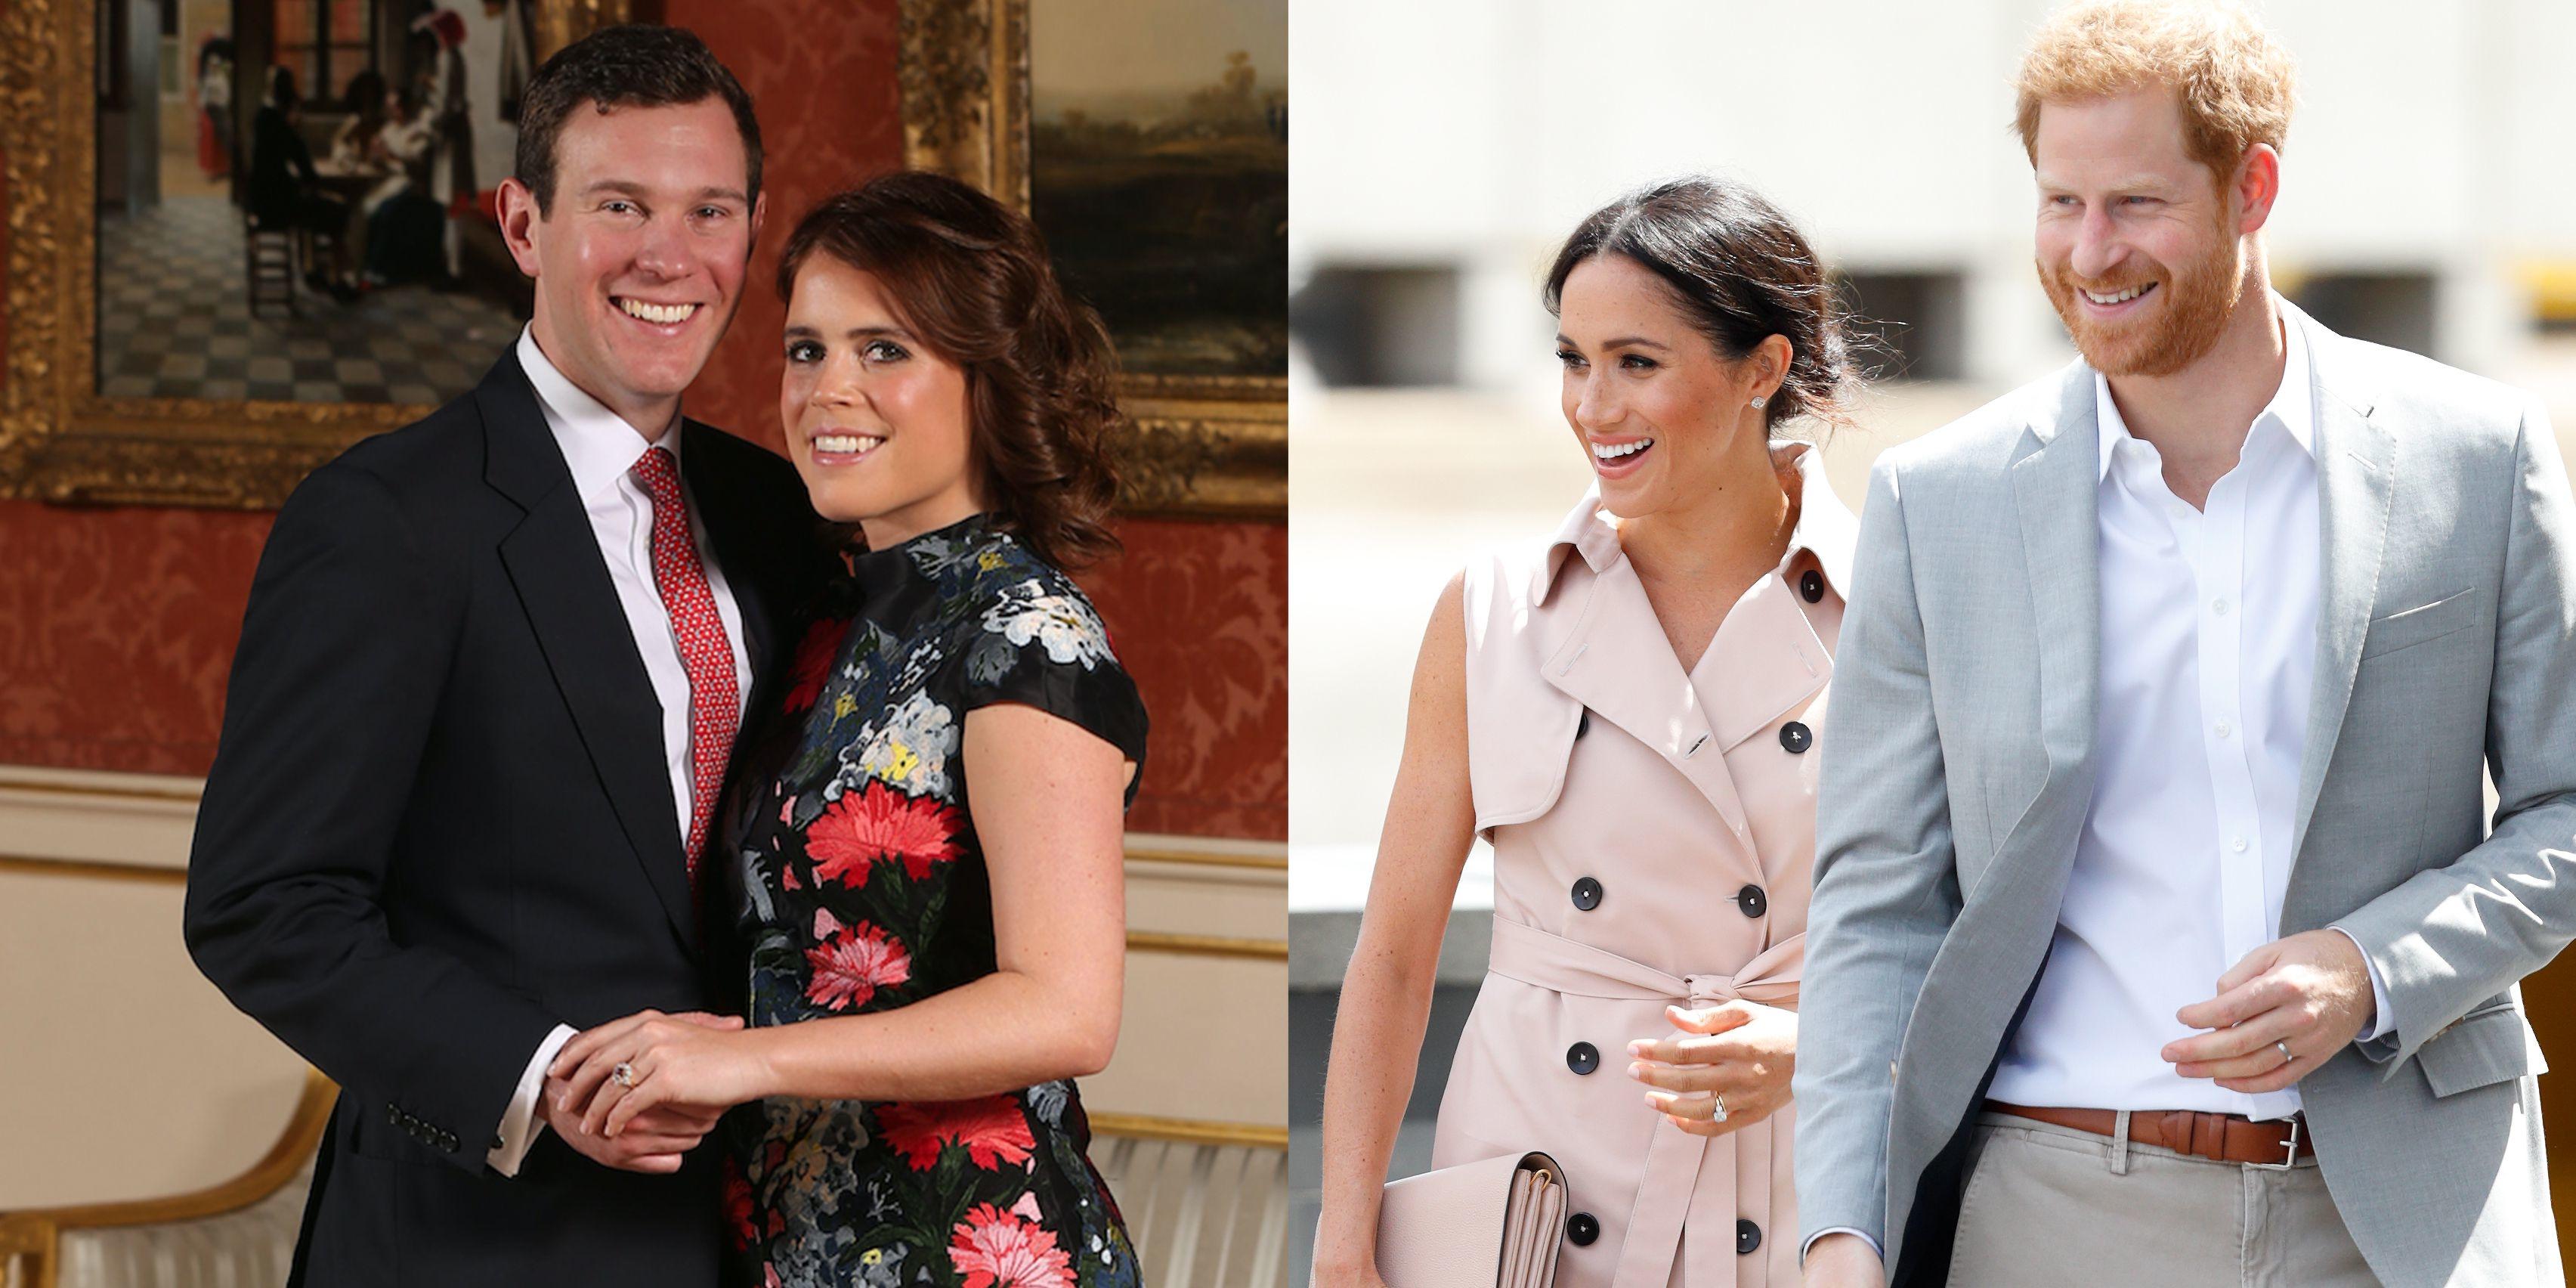 Princess Eugenie's Wedding Invites Compared To Prince Harry & Meghan Markle's